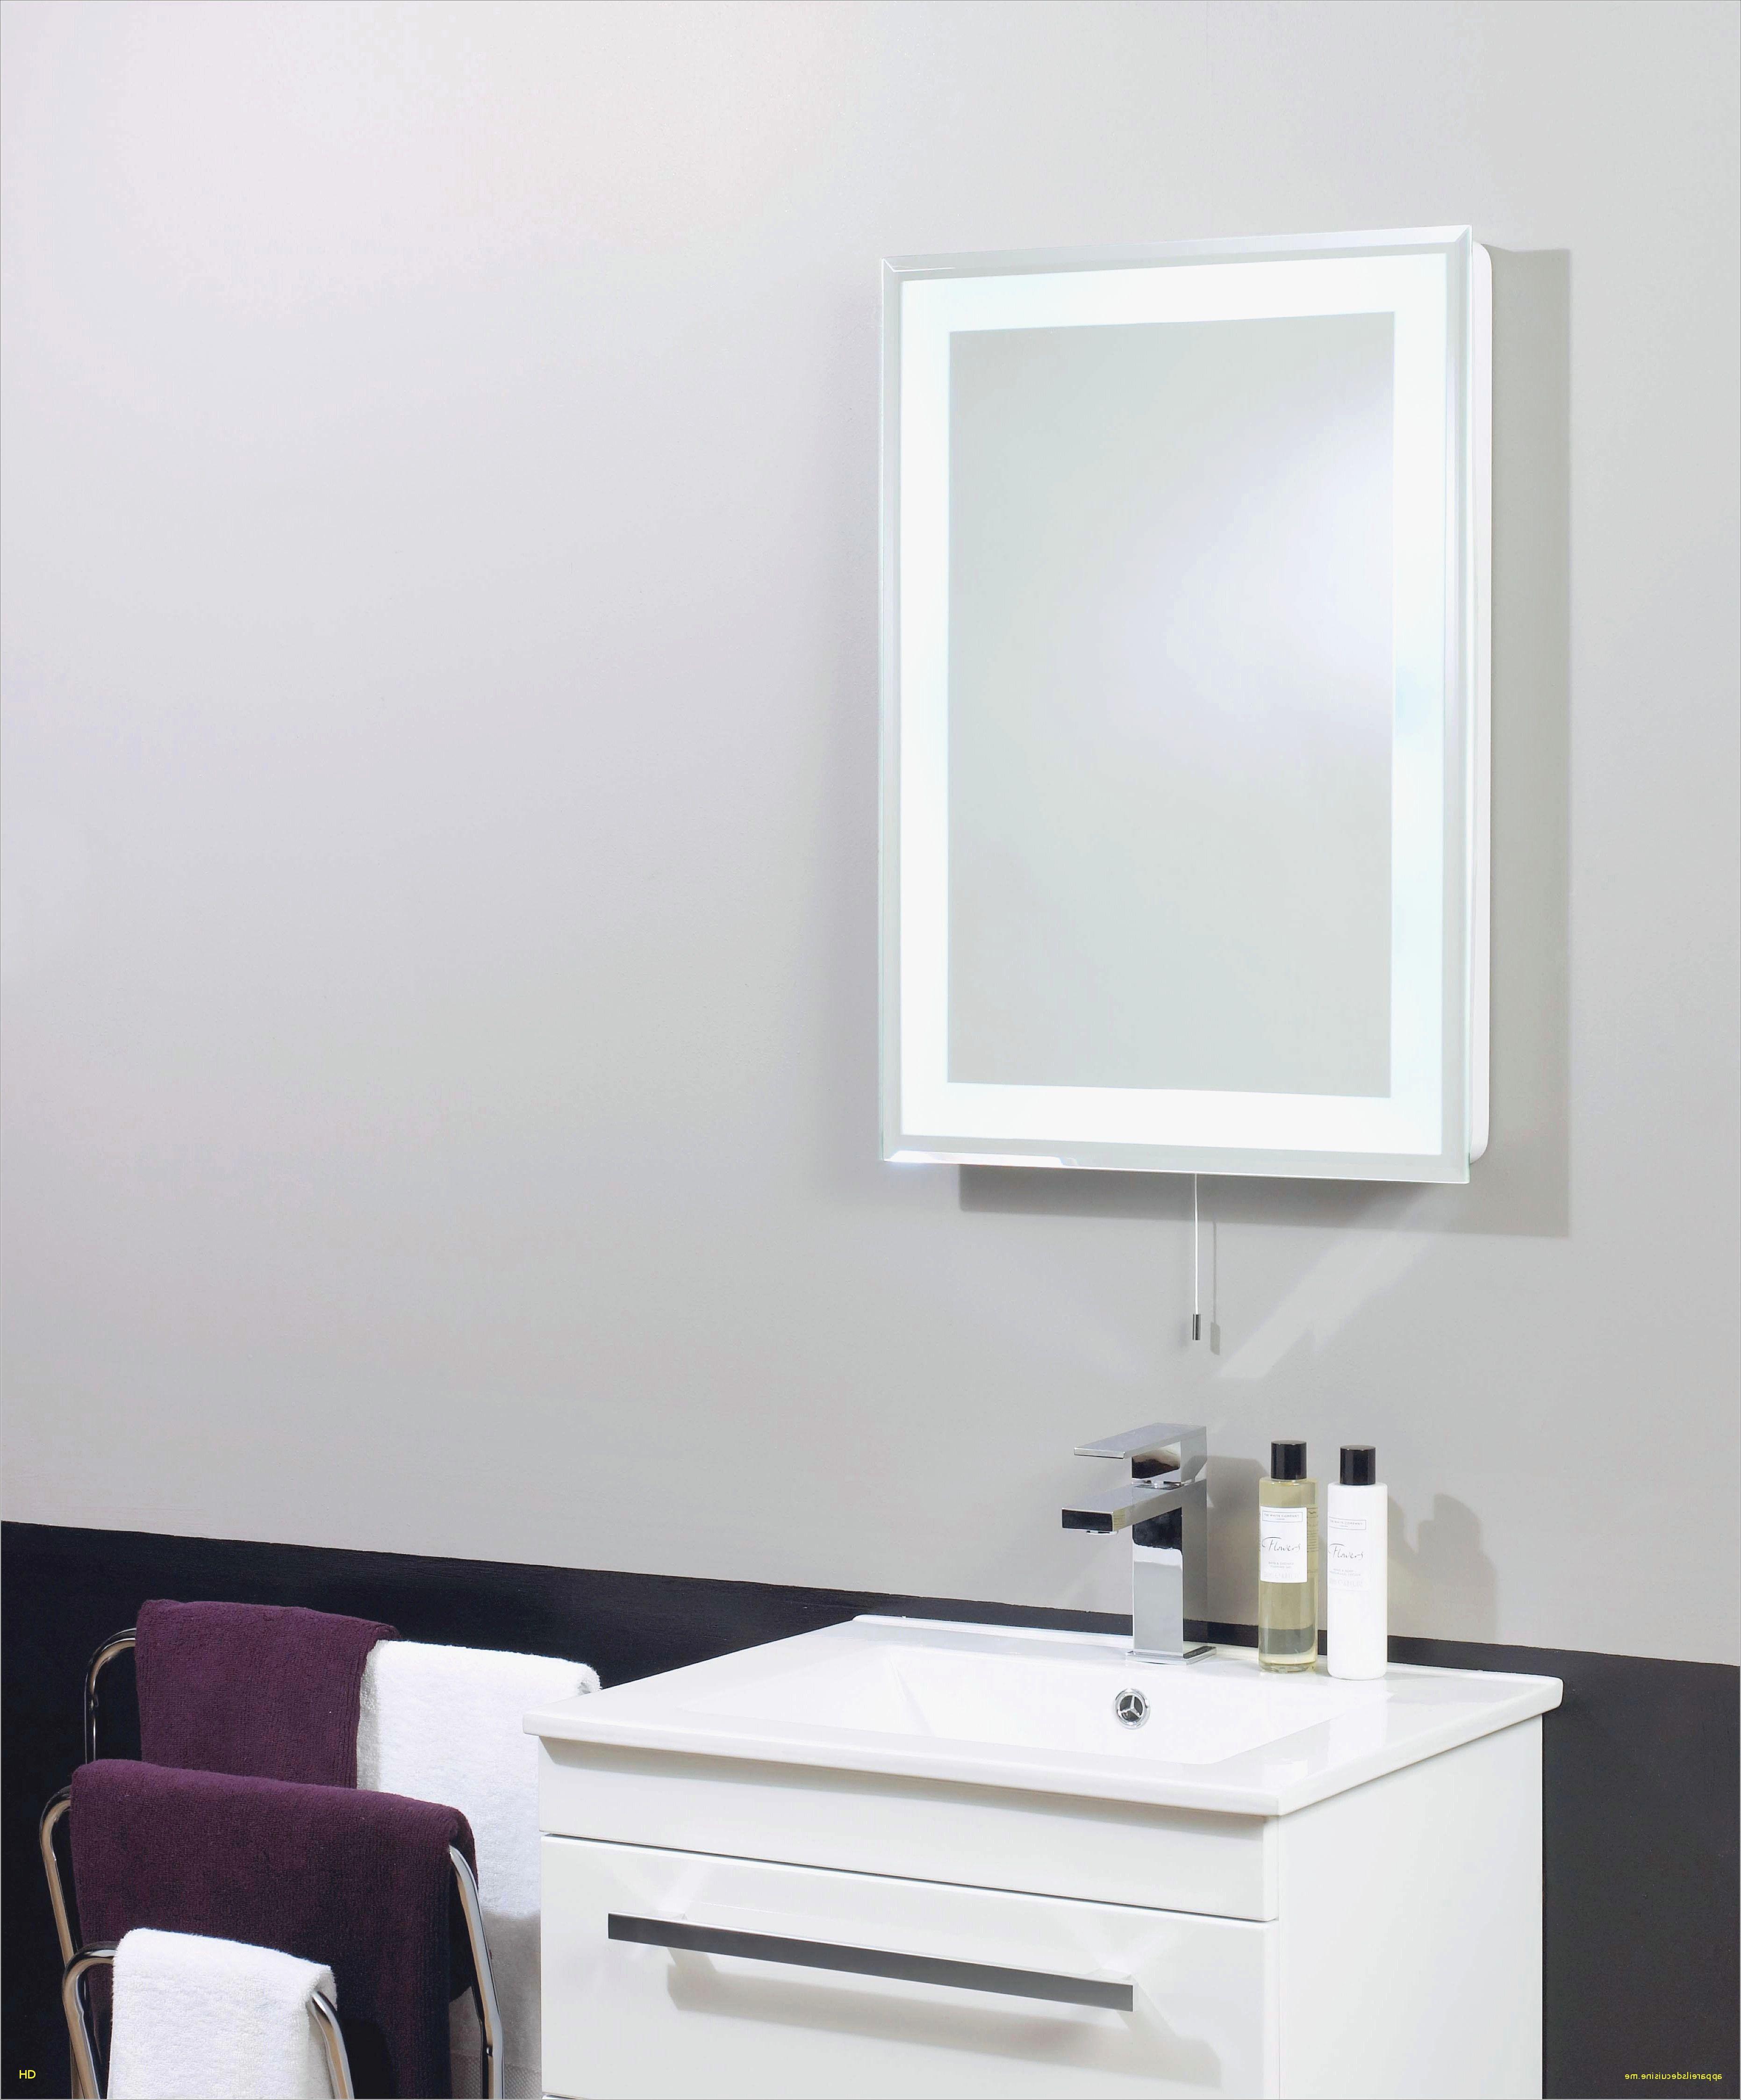 Leroy Merlin Armoire De Toilette Leroy Merlin Armoire De Toilette Armoire De Toilette L 90 Cm Bathroom Mirror Modern Bathroom Vanity Bathroom Mirror Cabinet